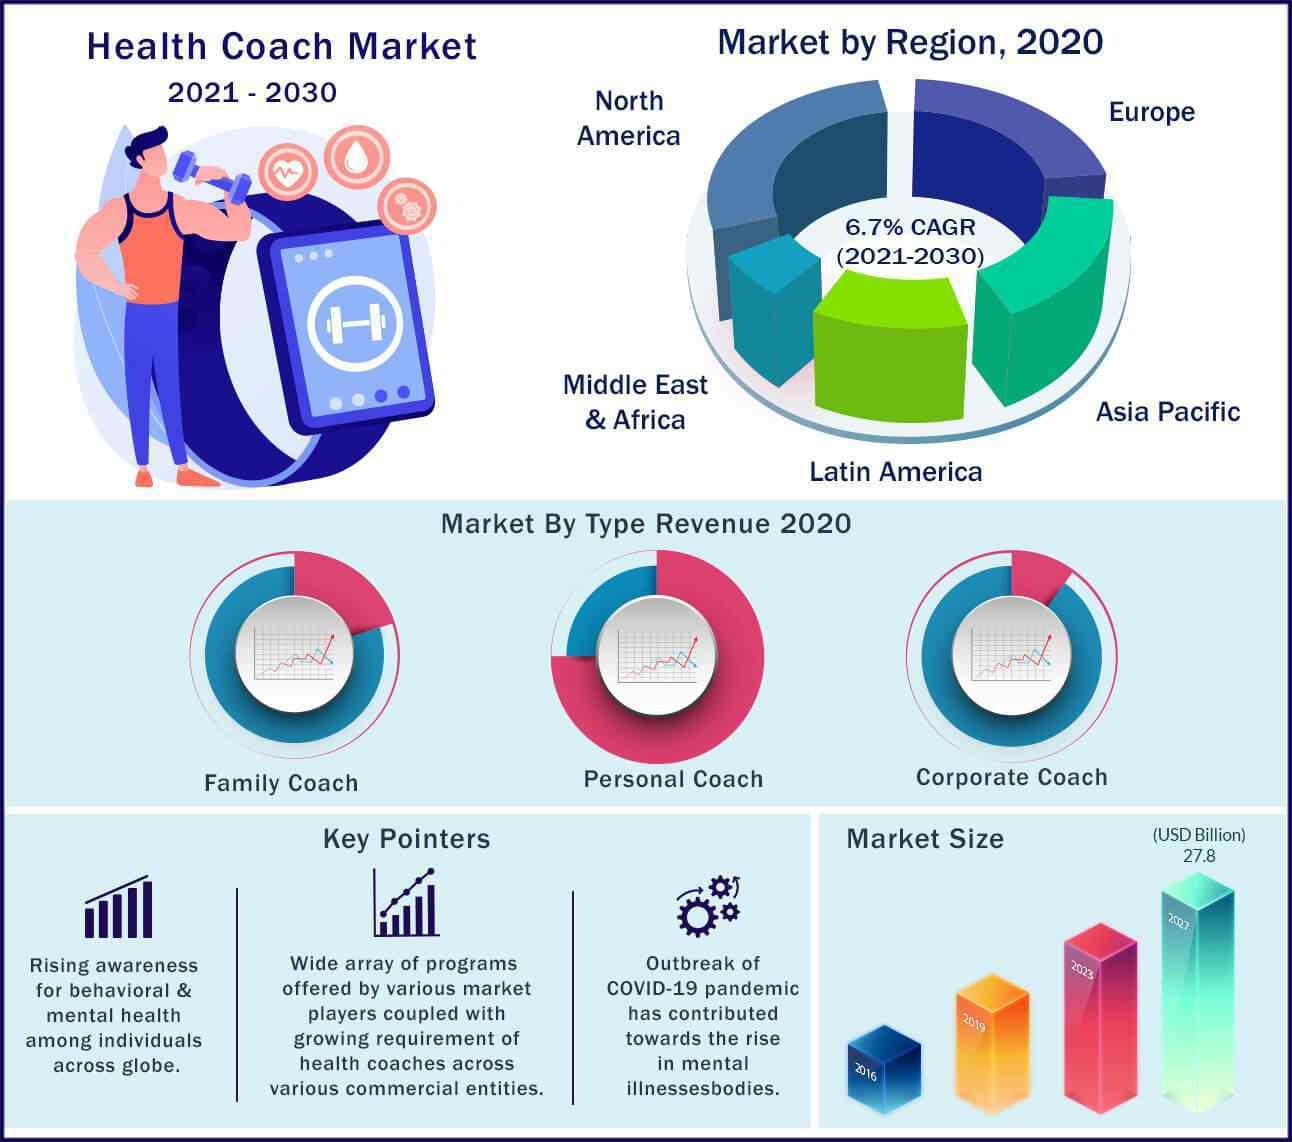 Global Health Coach Market 2021-2030